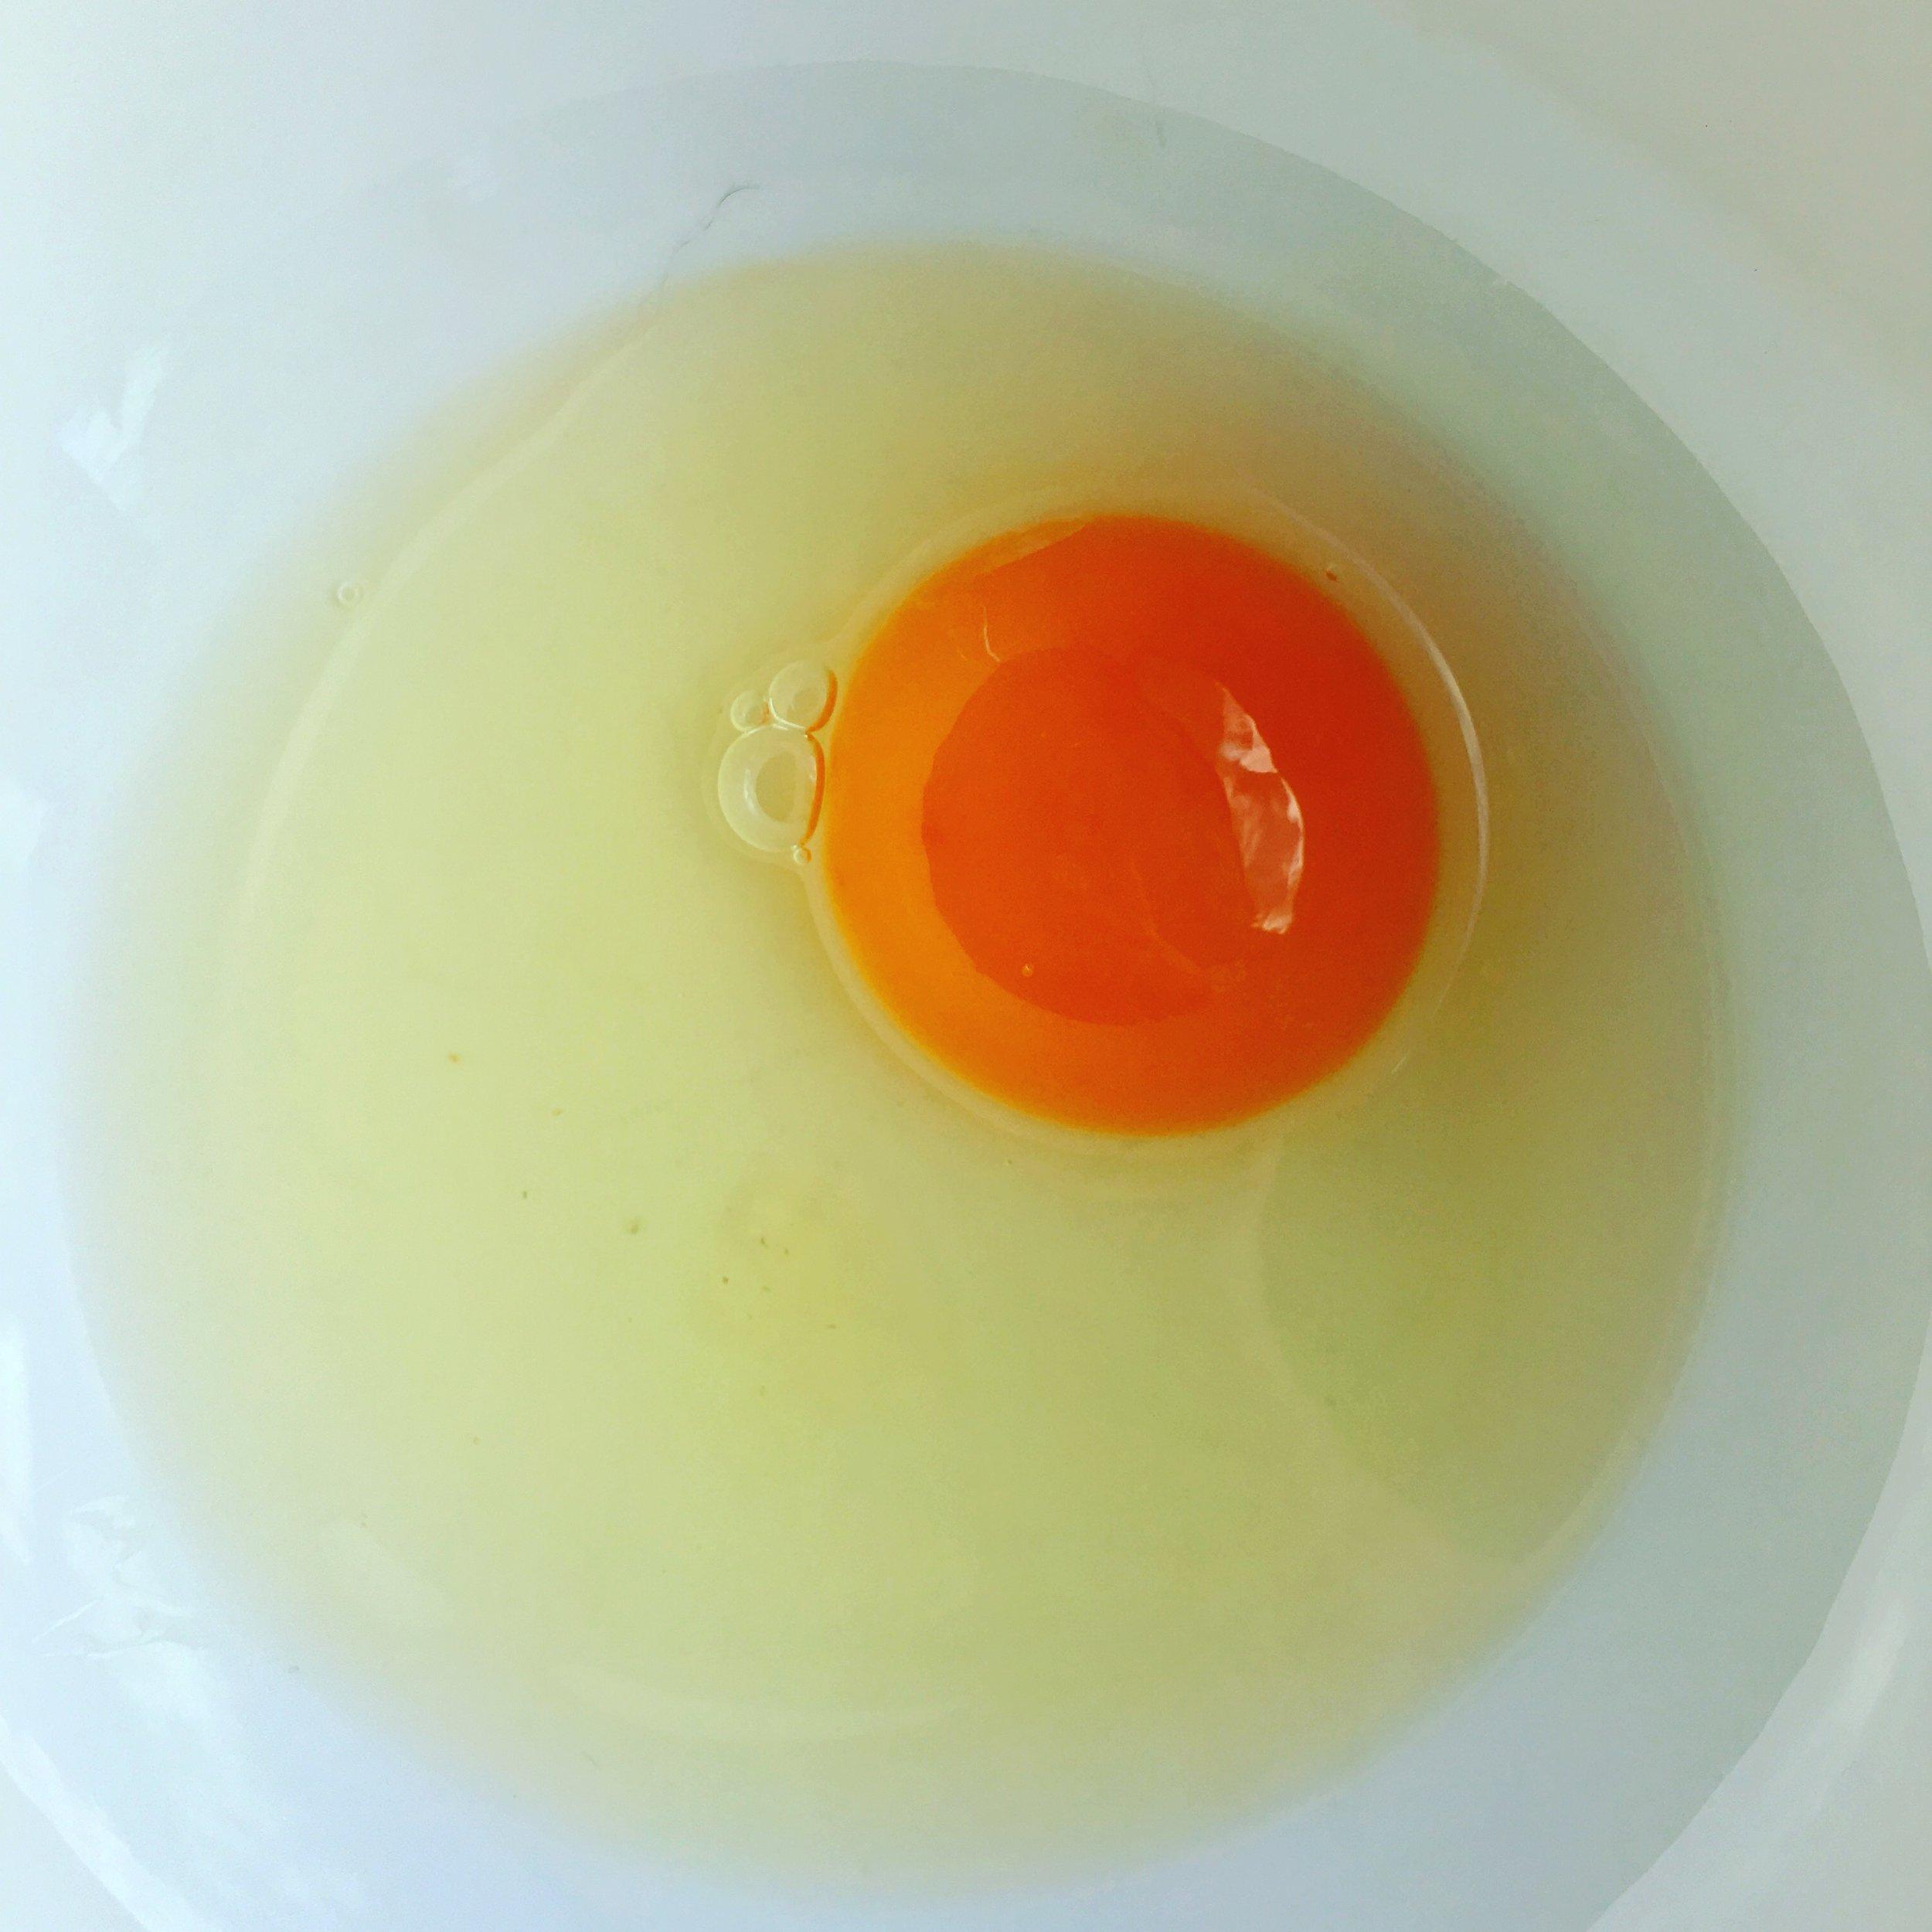 Yolkporn